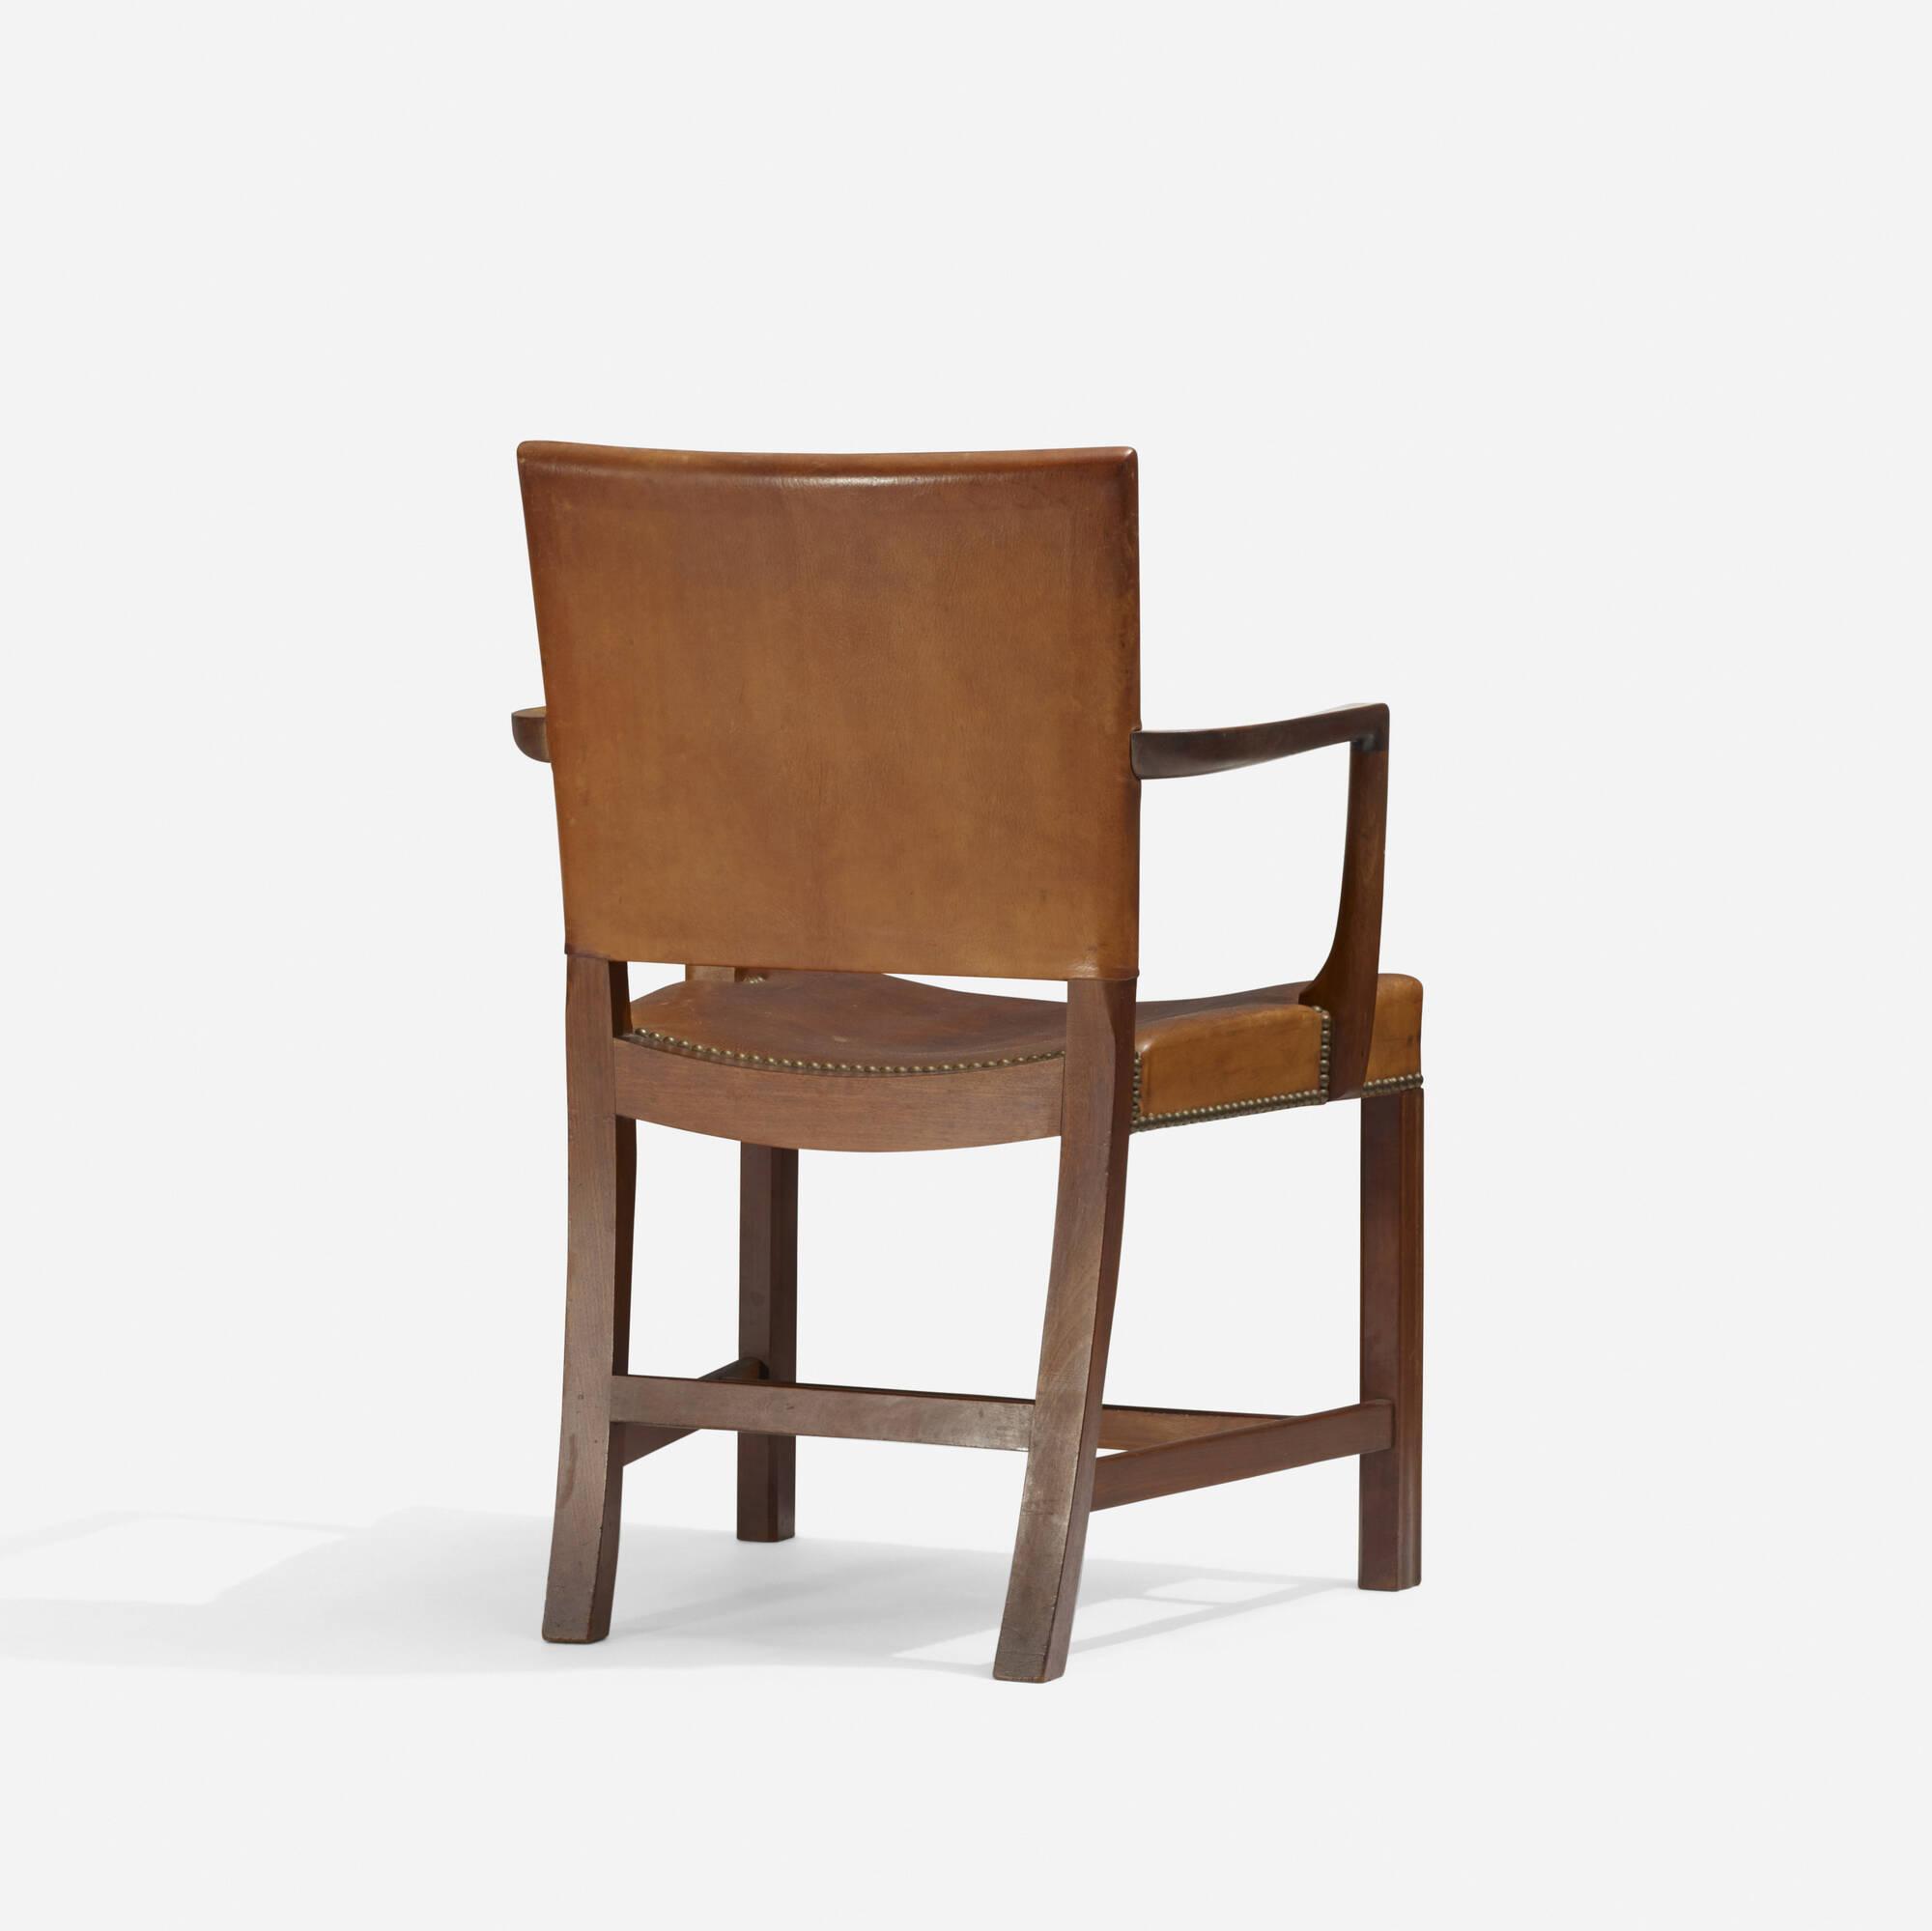 185: Kaare Klint / Red armchair and desk, model 4155 (2 of 2)